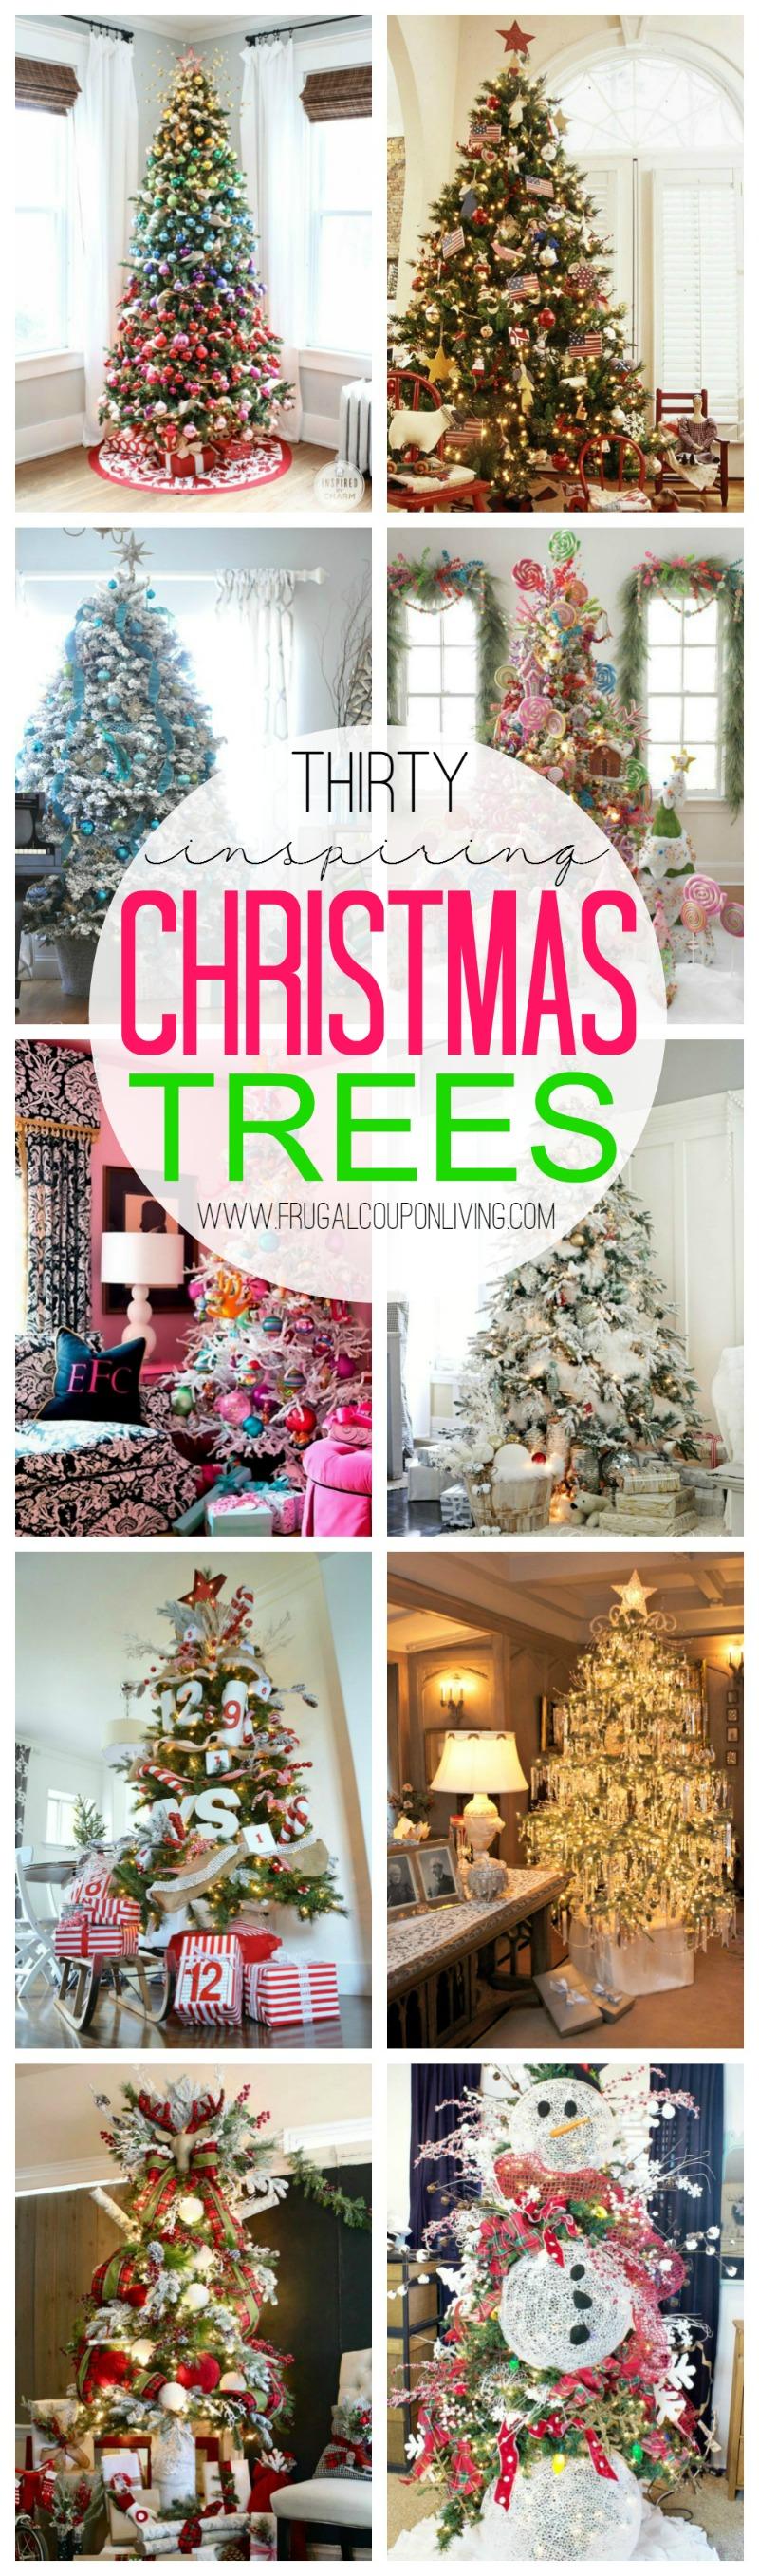 Thirty Inspiring Christmas Trees on Frugal Coupon Living